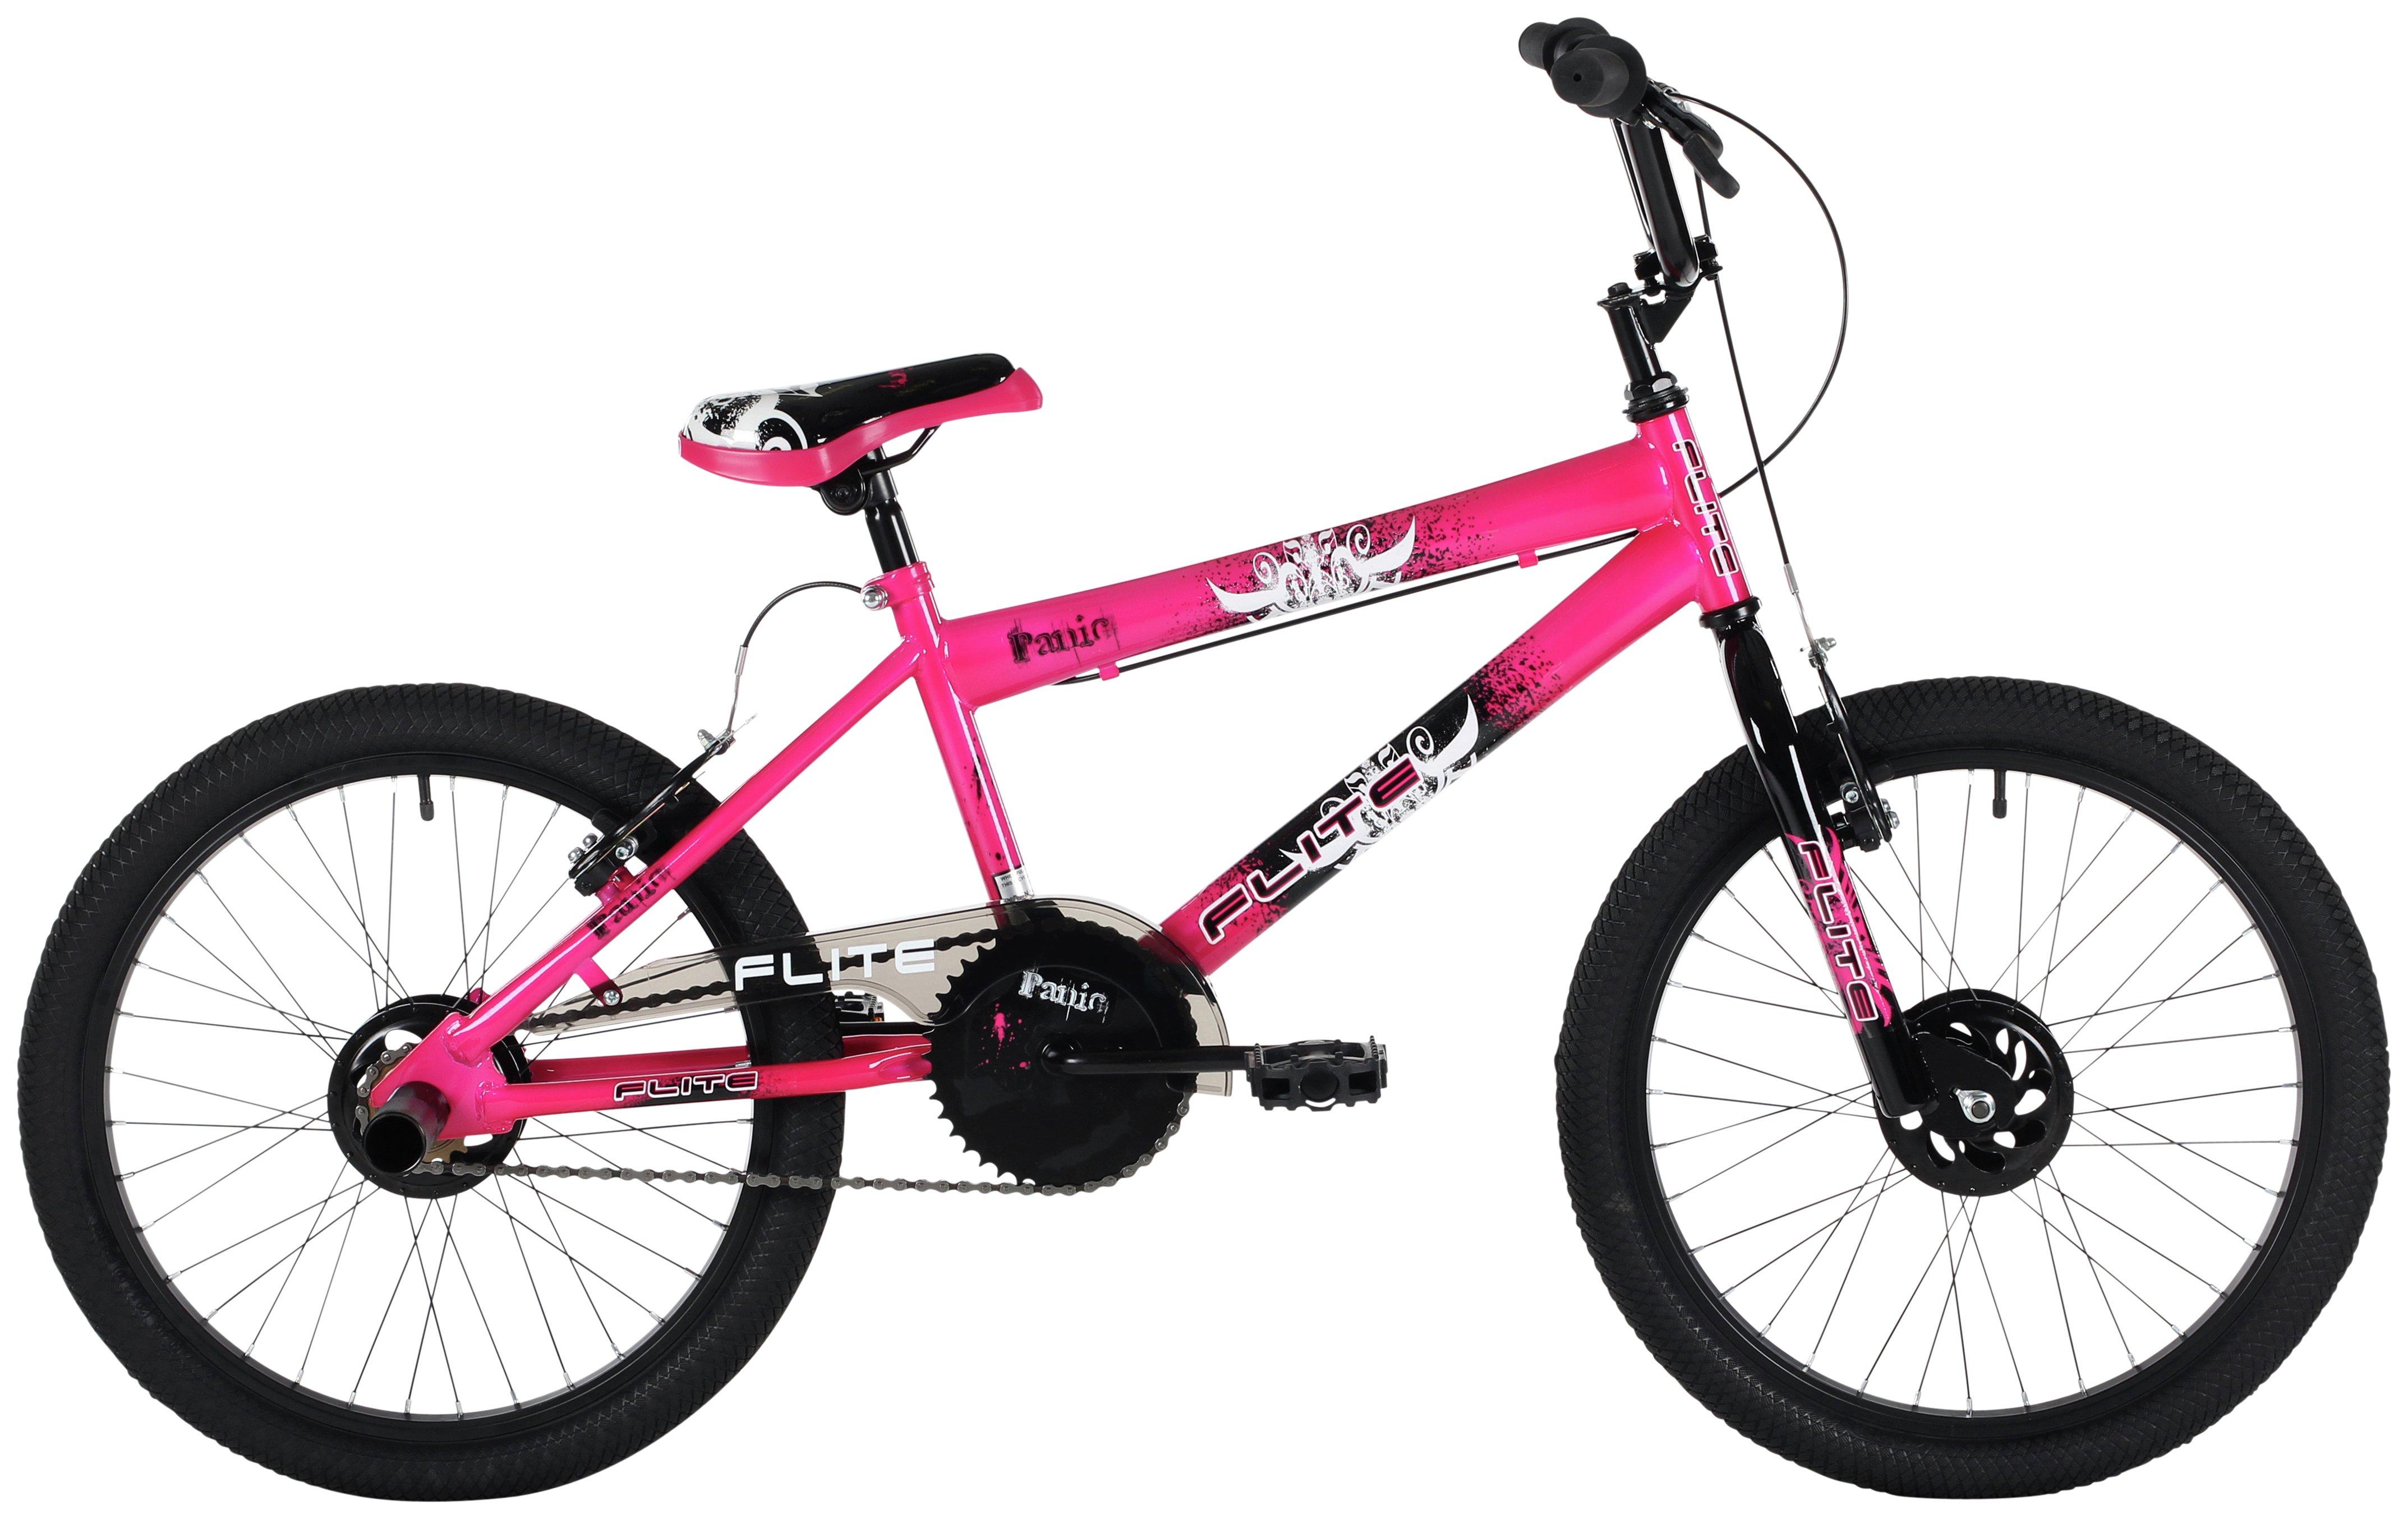 Flite Panic 20 Inch BMX Bike